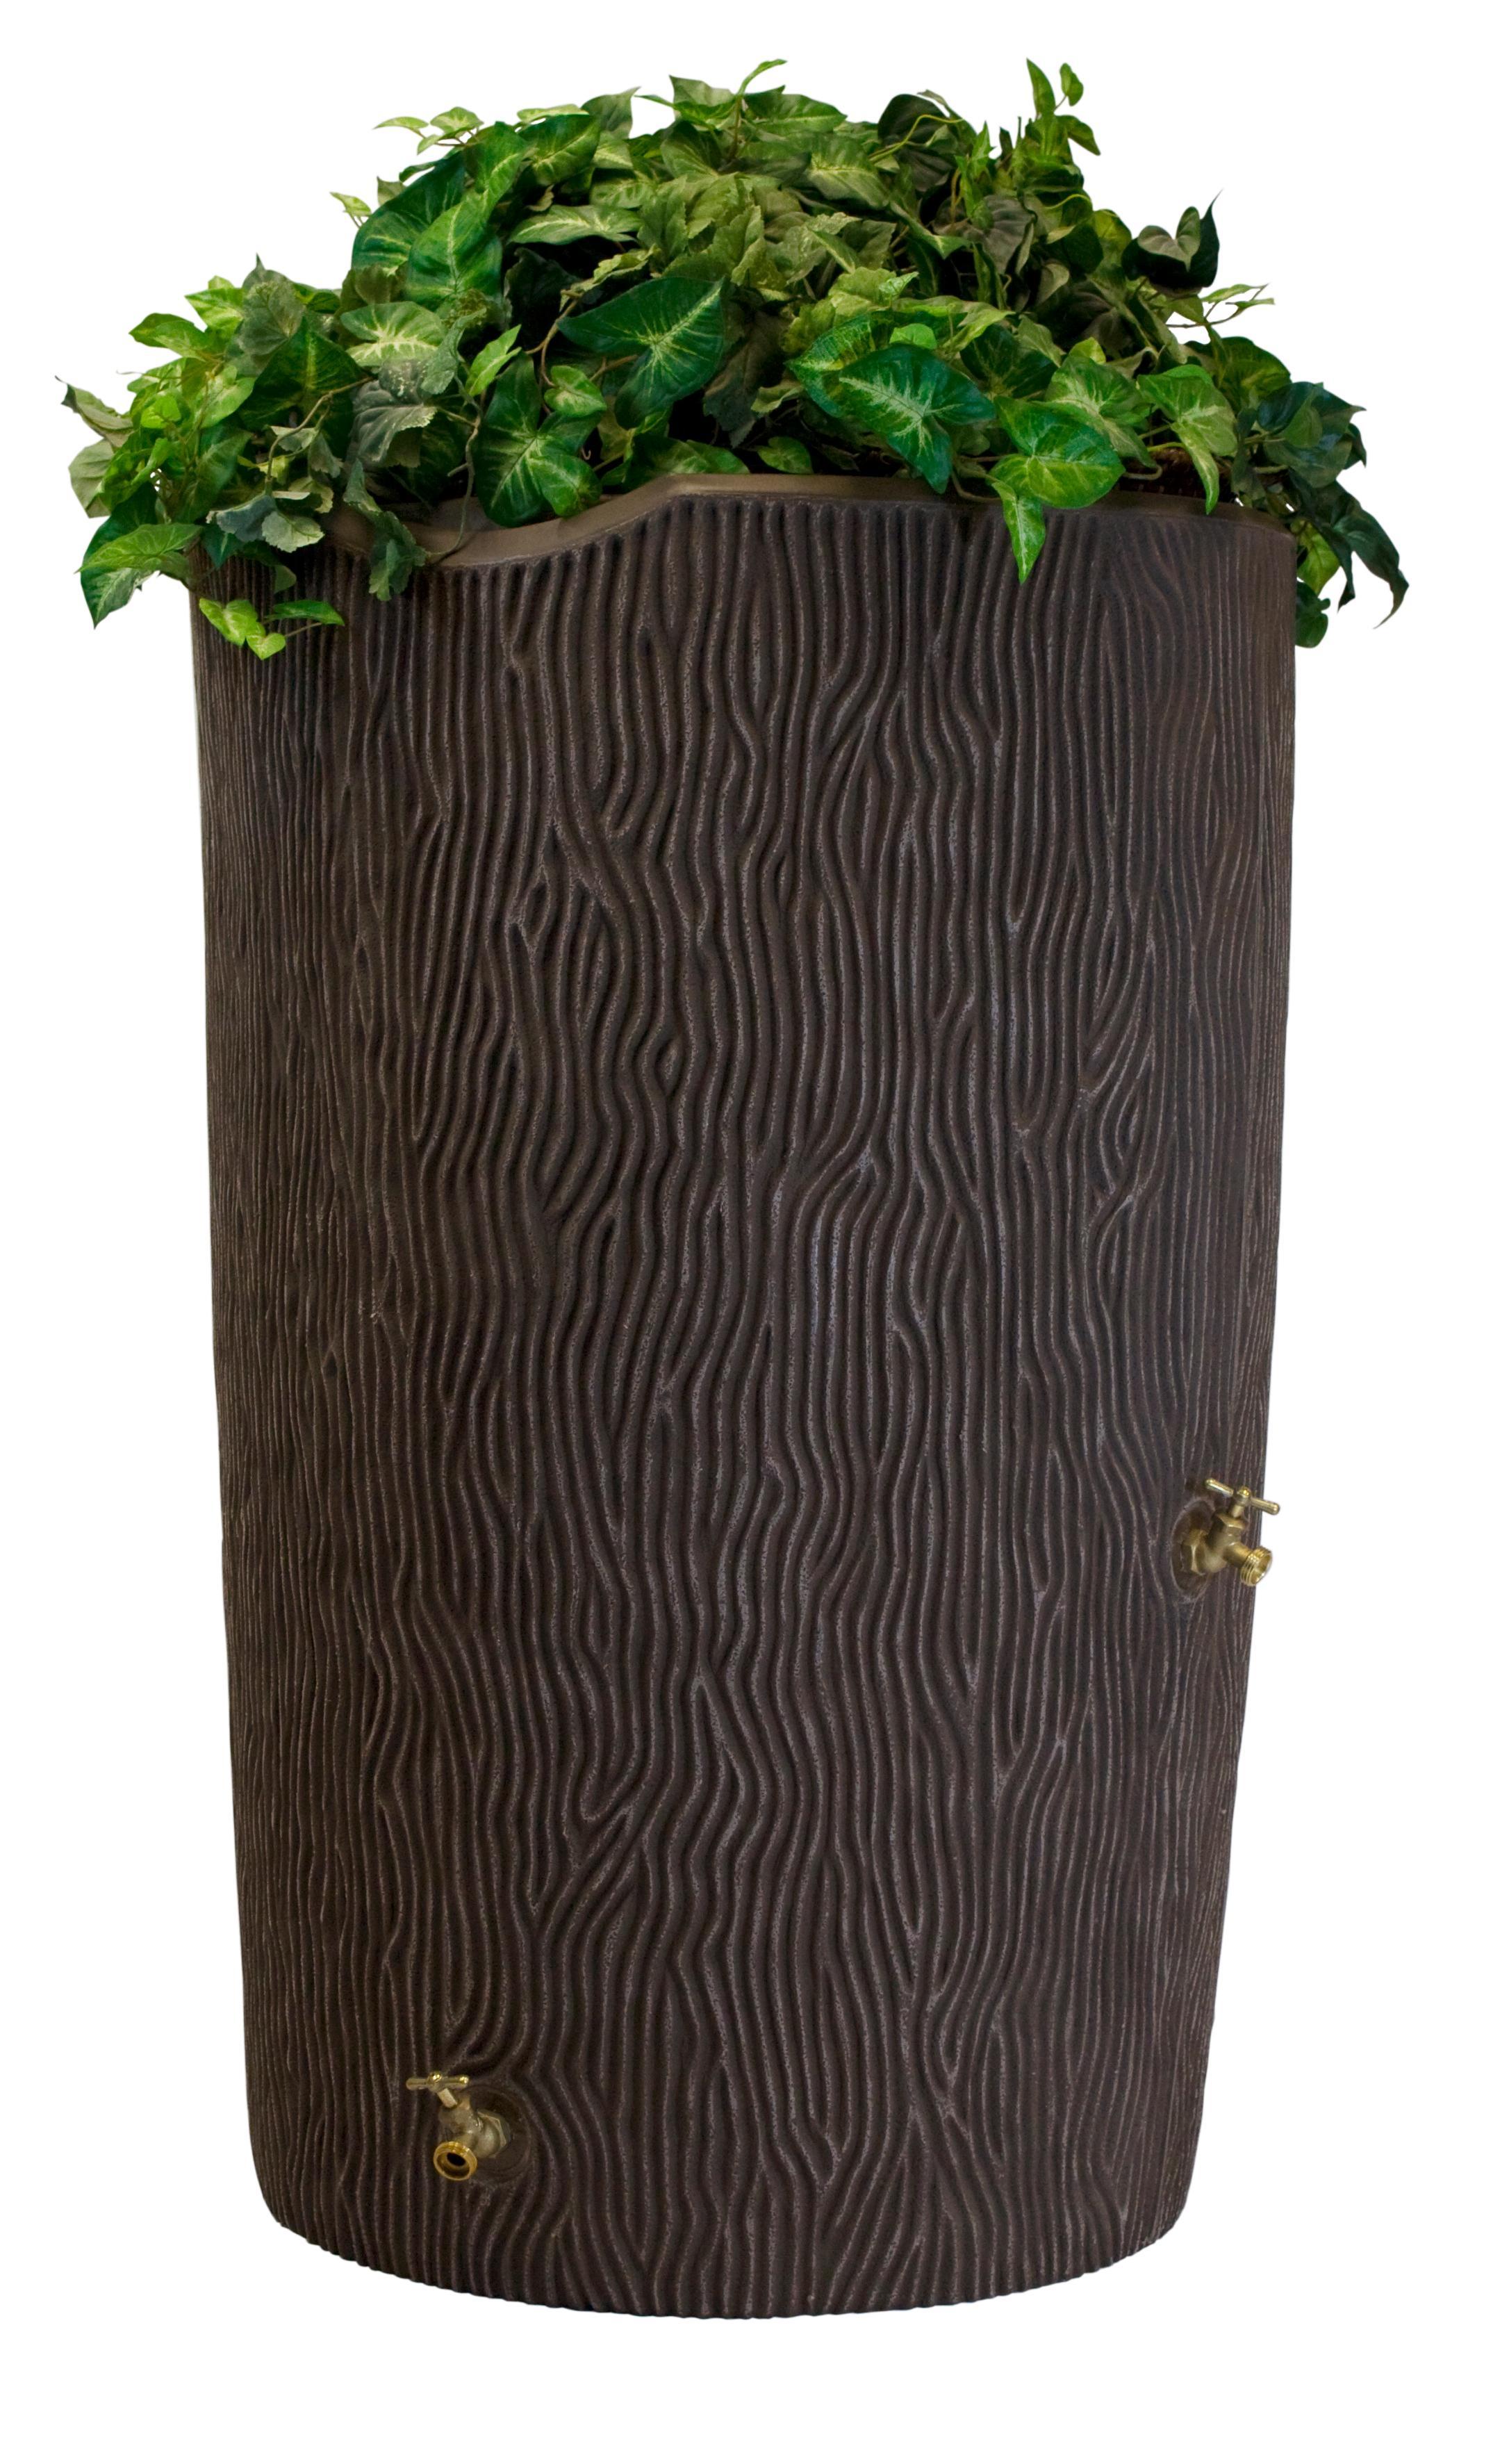 Ideas IMP-C90-OAK Impressions Tree Bark Rain Barrel, 90-Gallon, Oak